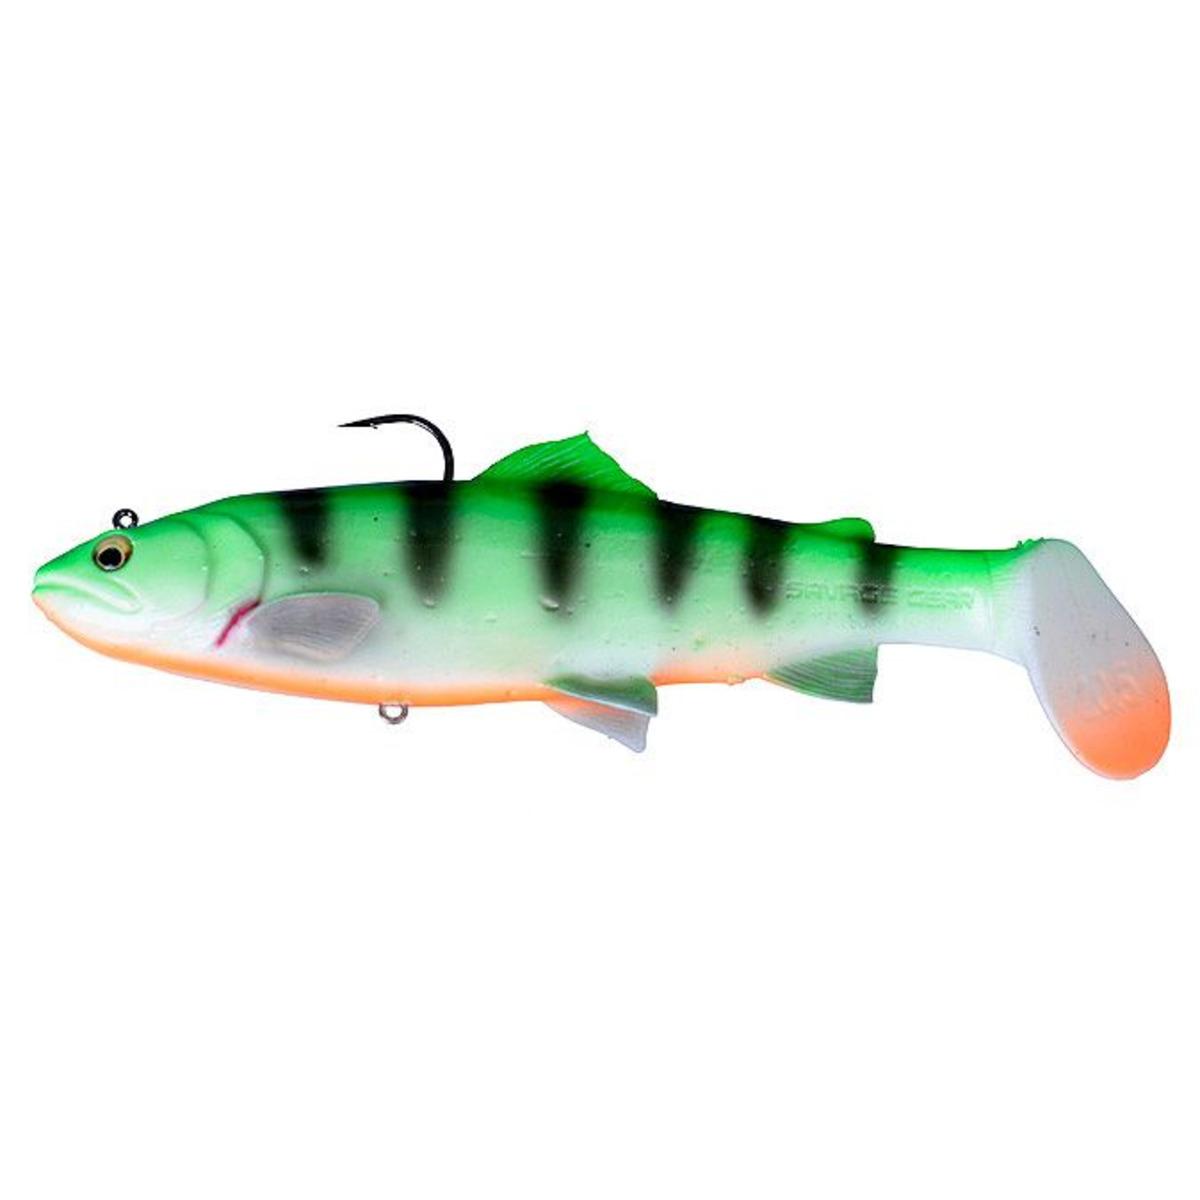 Savage Gear 3D Trout Rattle Shad - 12.5 cm - 35 g - Firetiger